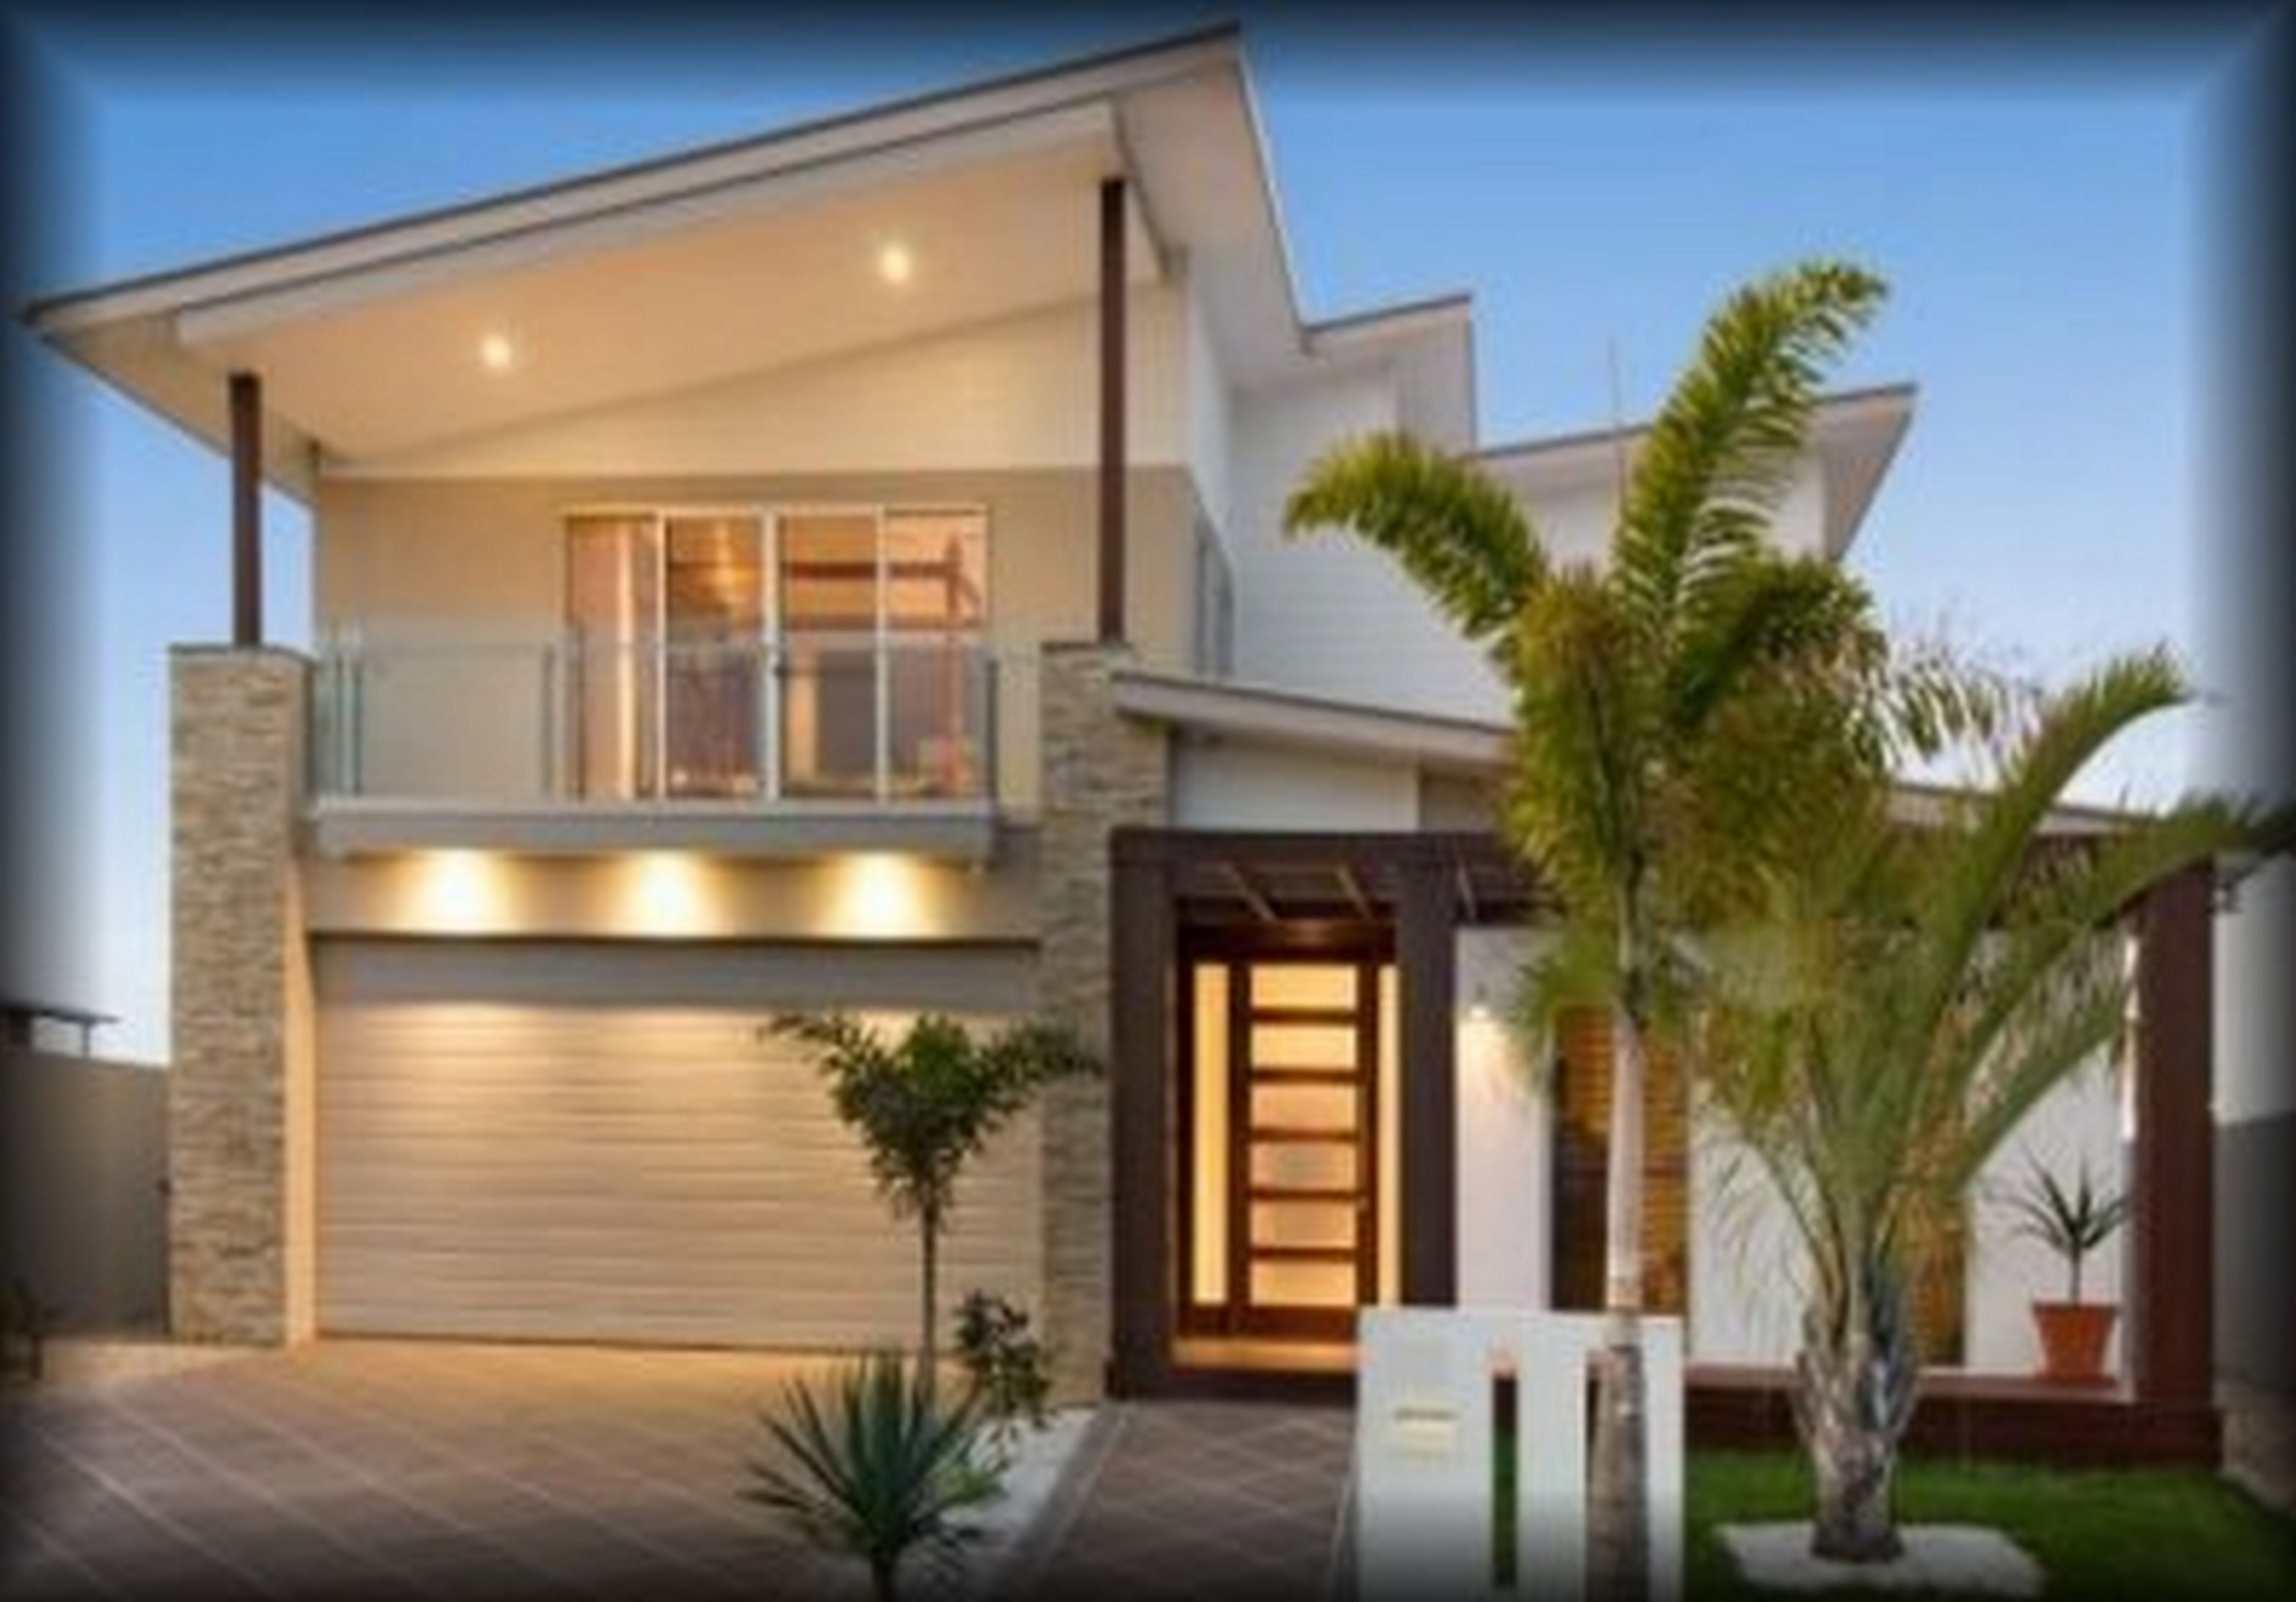 25 Best Small Modern Home Design Idea On A Budget 2 Storey House Design House Plans Australia Small Modern House Plans